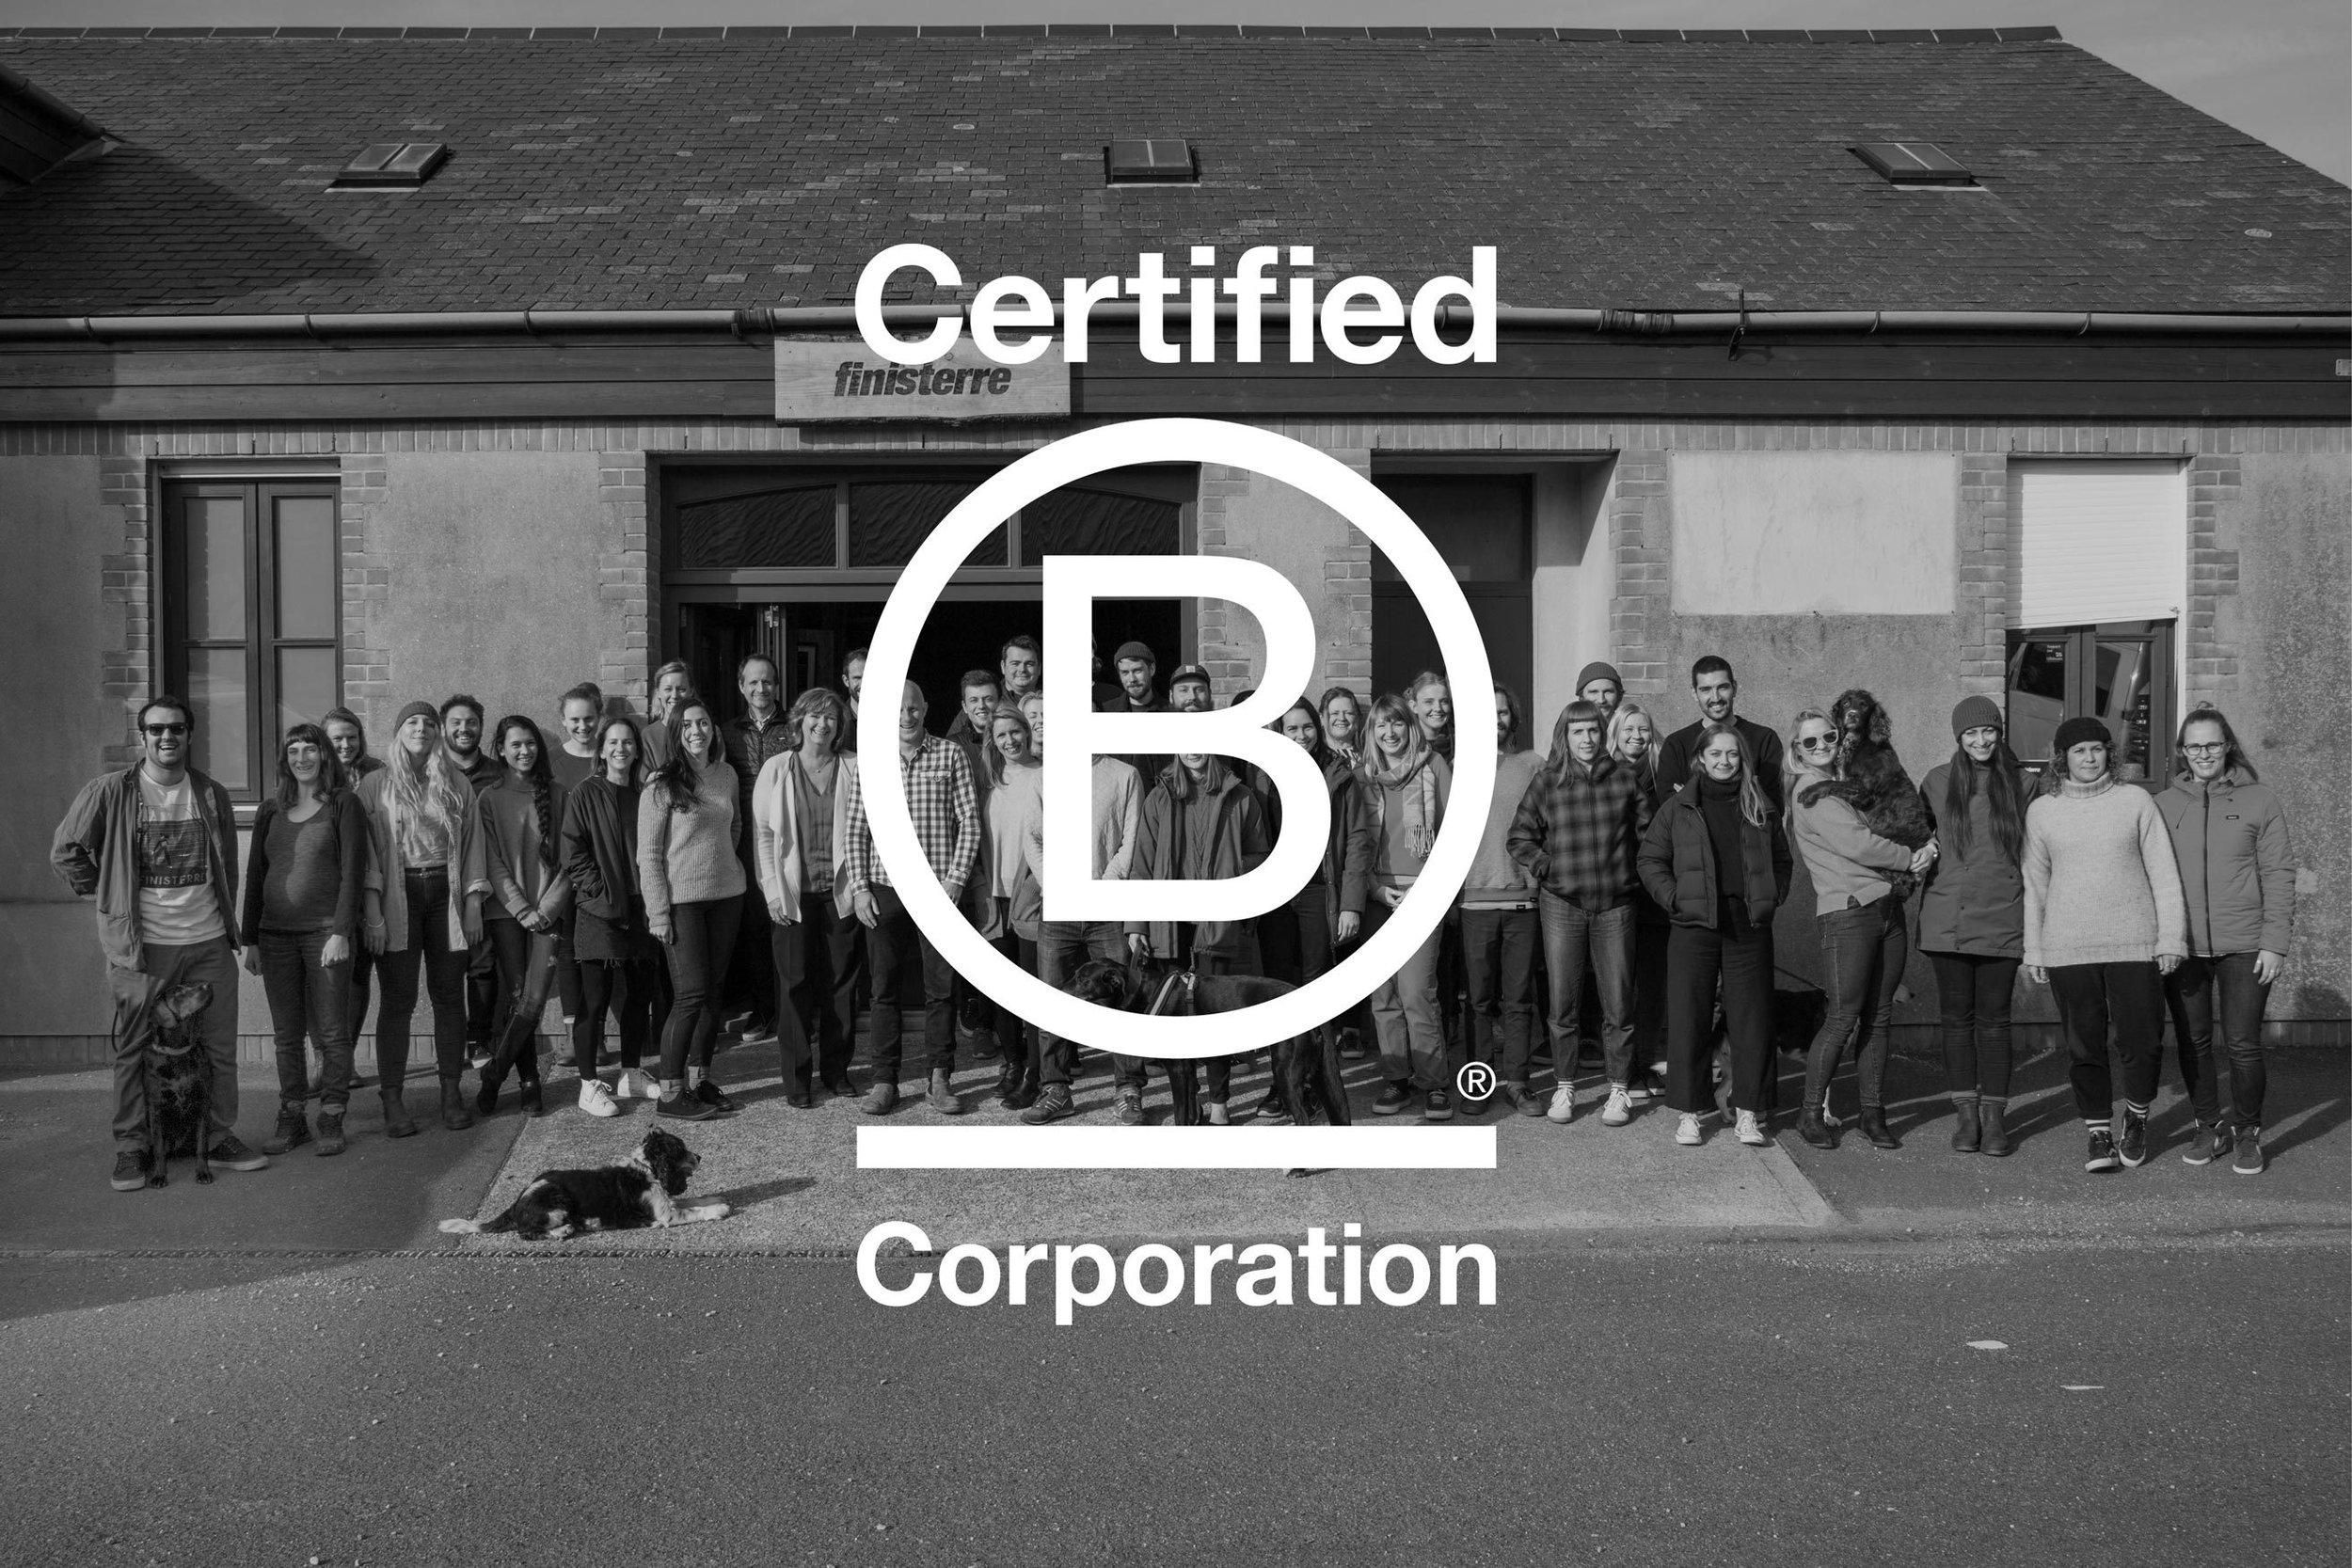 b-corp-team-photo-sfw.jpg